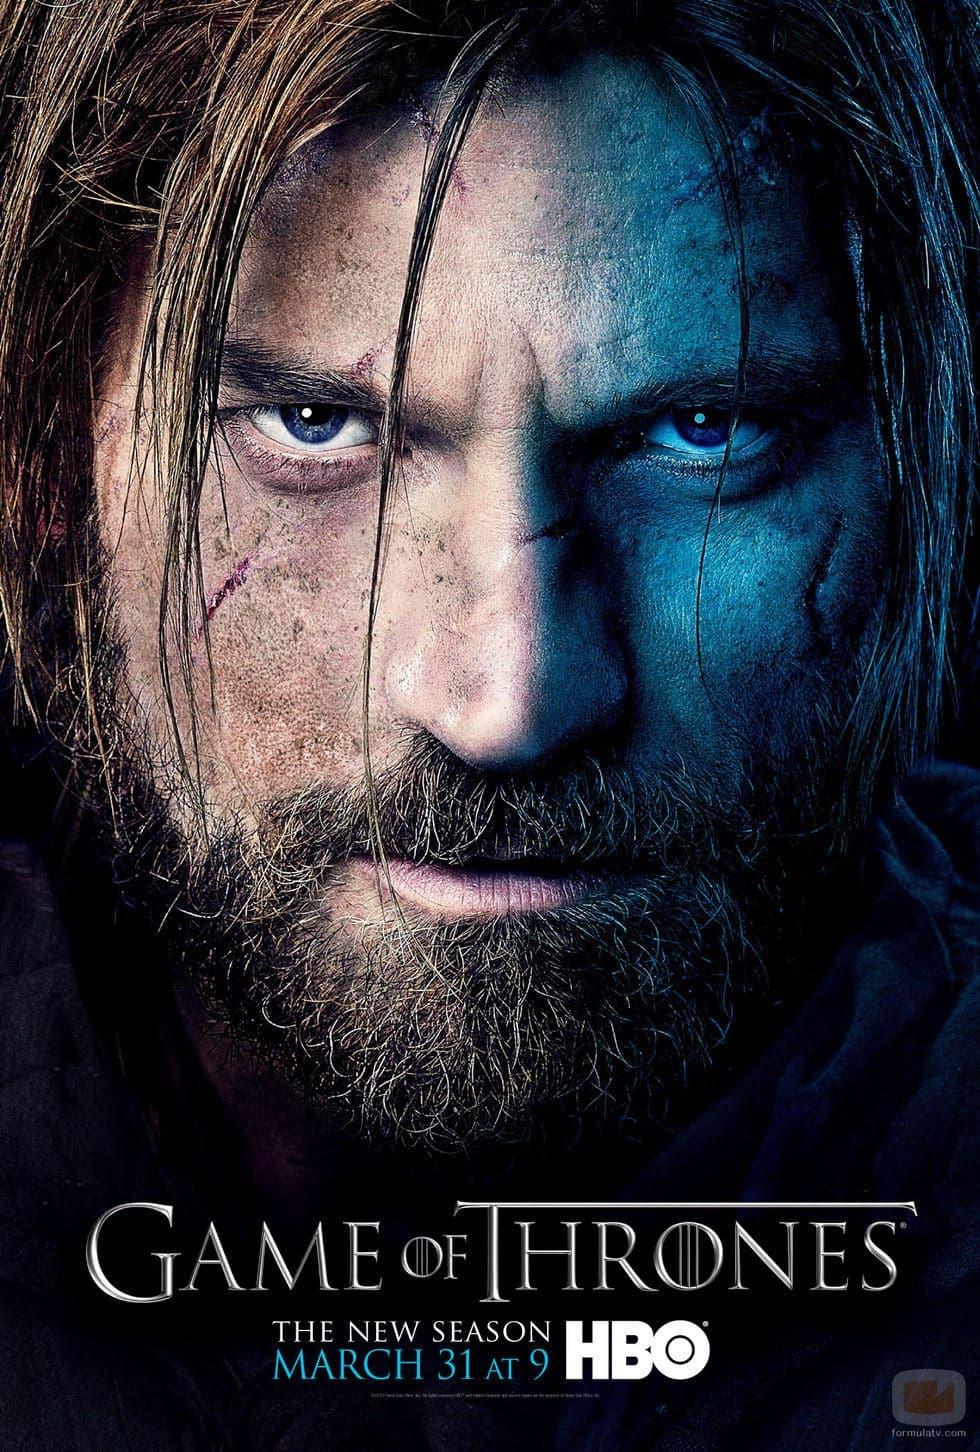 jaime-lannister-poster-promocional-tercera-temporada-juego-de-tronos